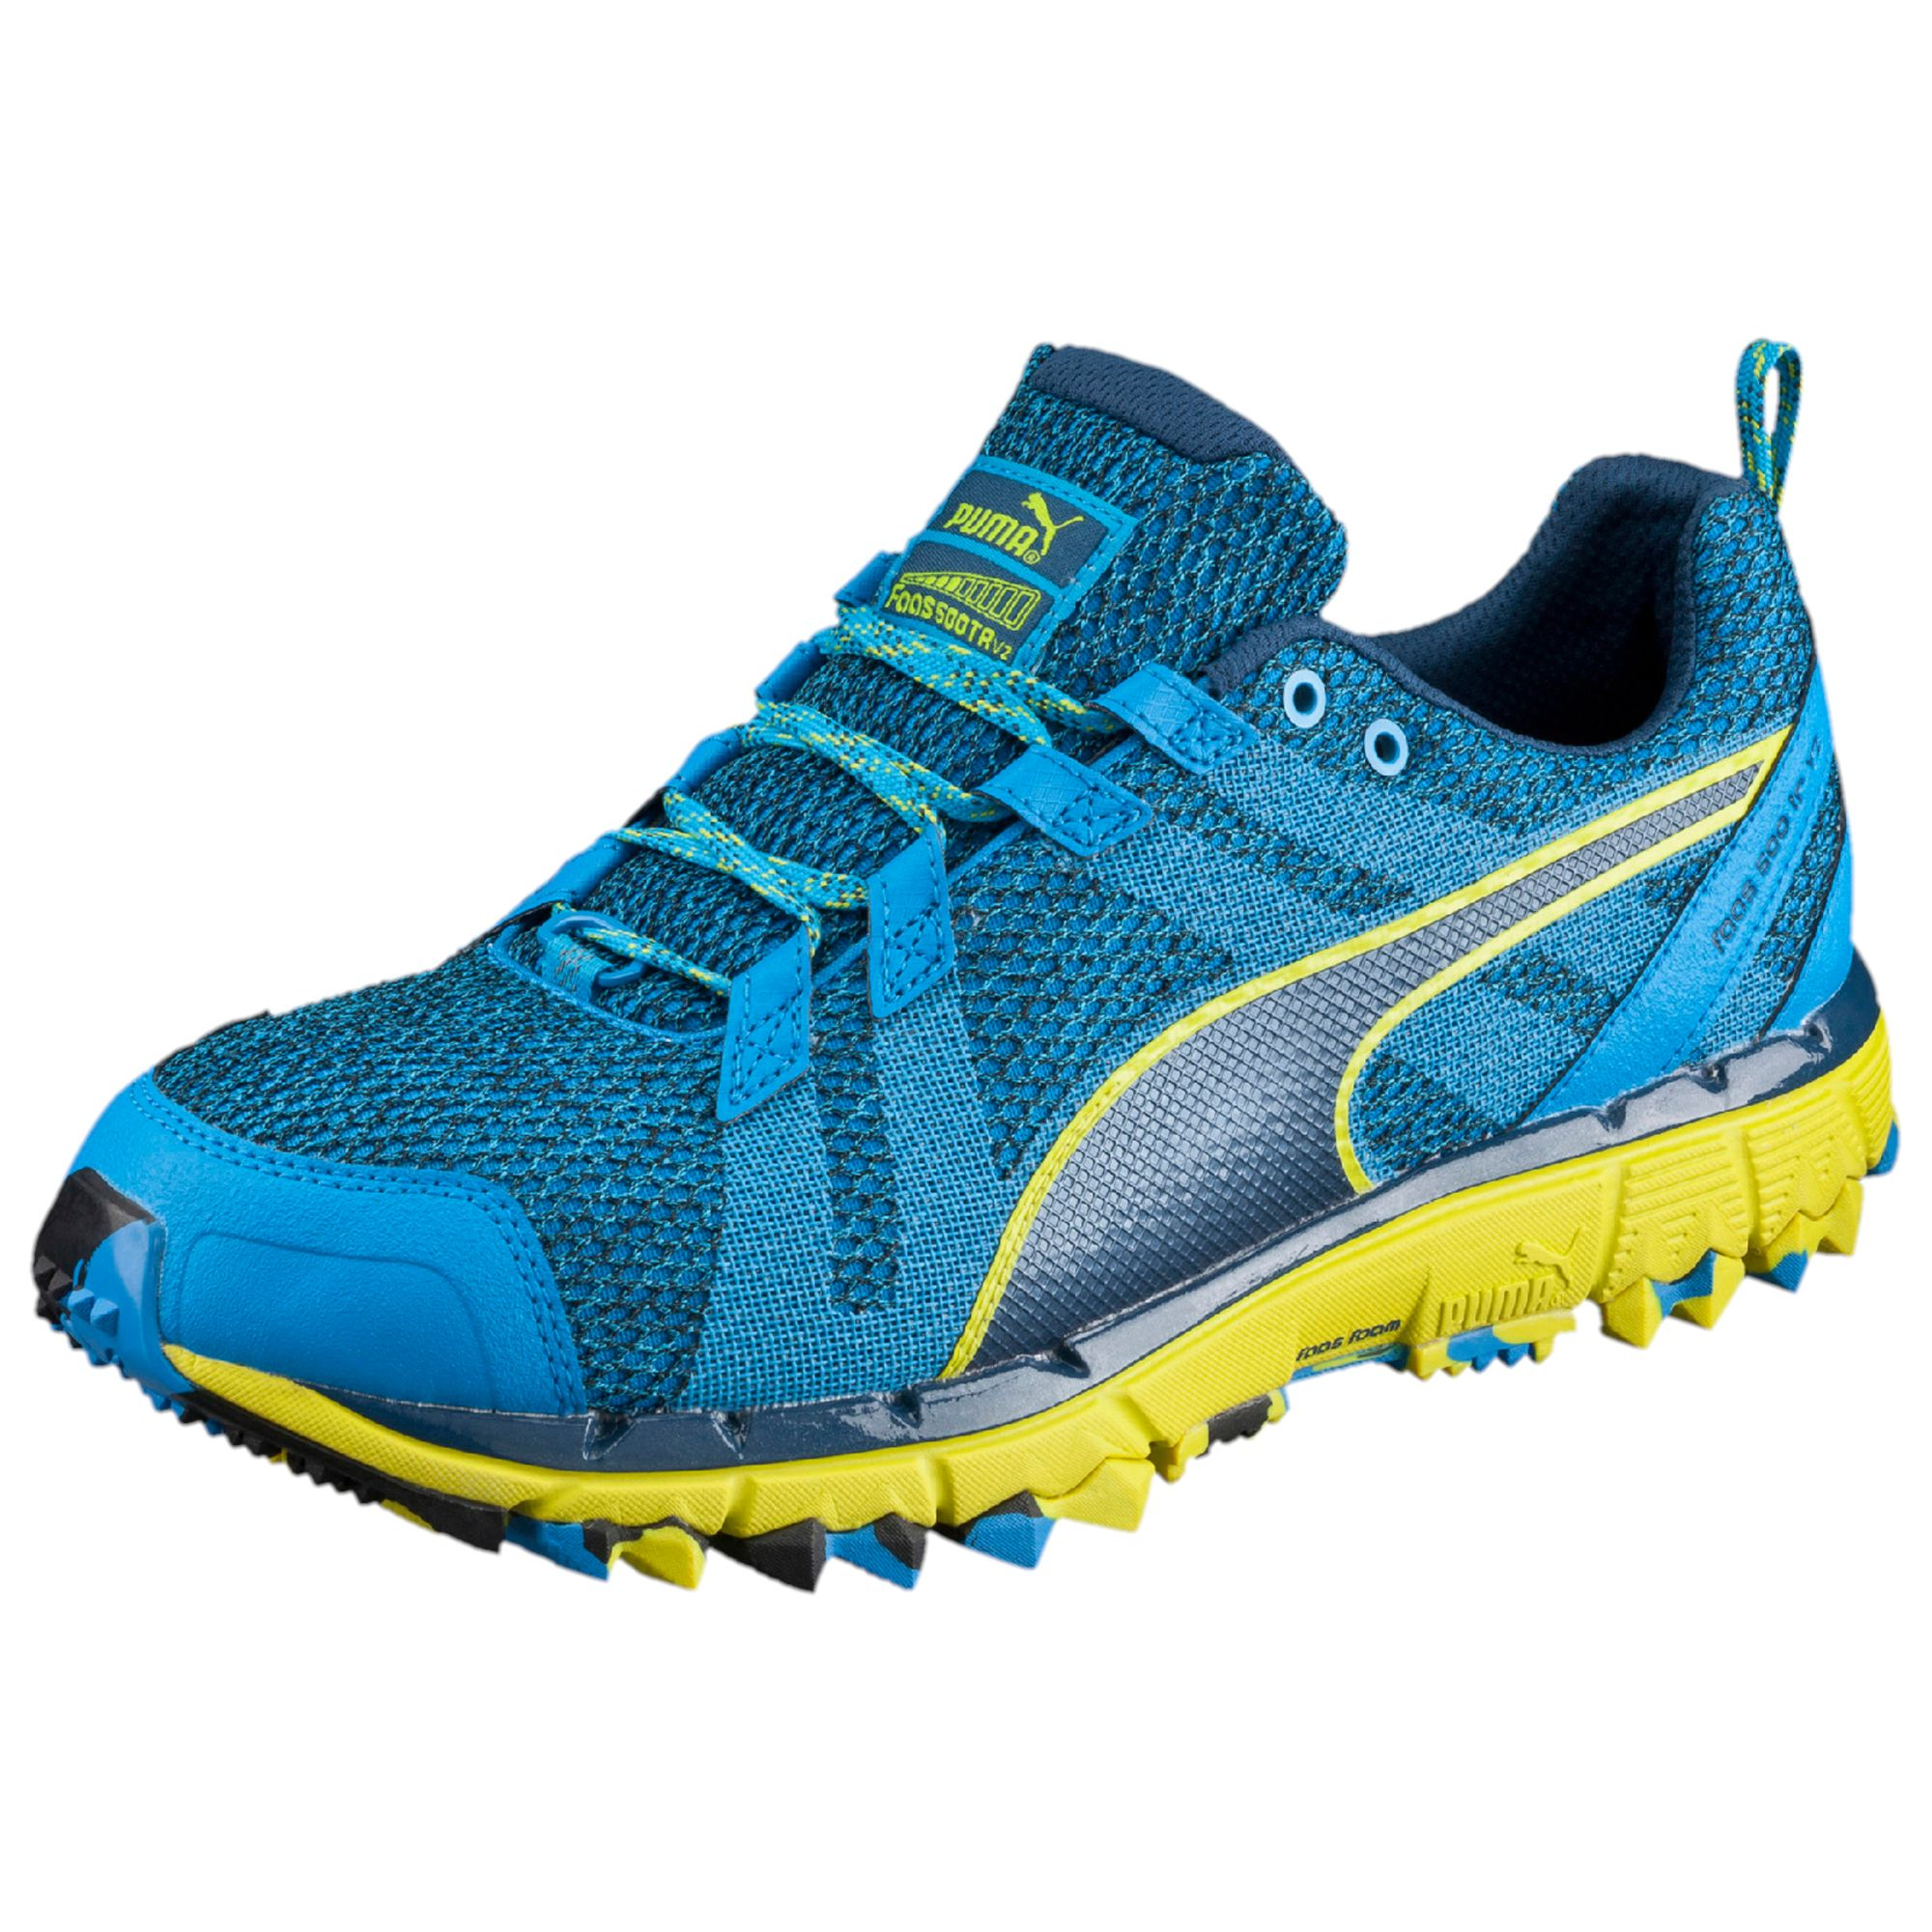 d19b46167616 PUMA FAAS 500 TR v2 Trail Running Shoes Footwear Neutral Running Men ...